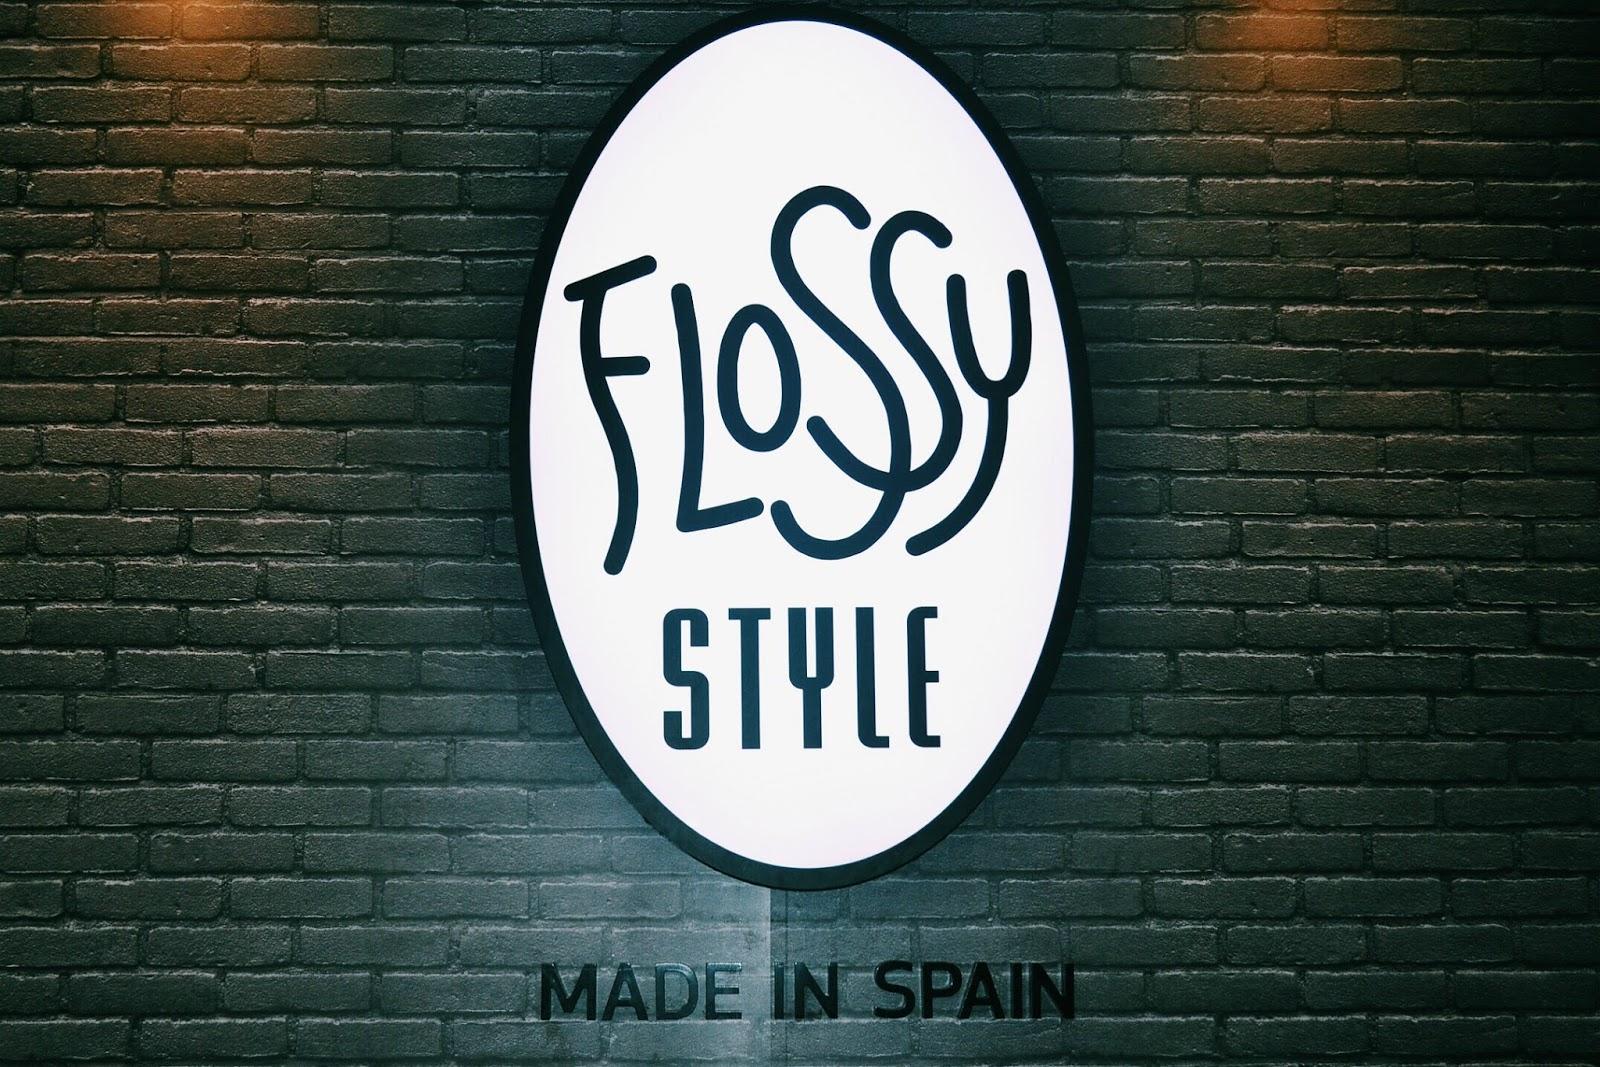 Flossy Footwear opens in Davao